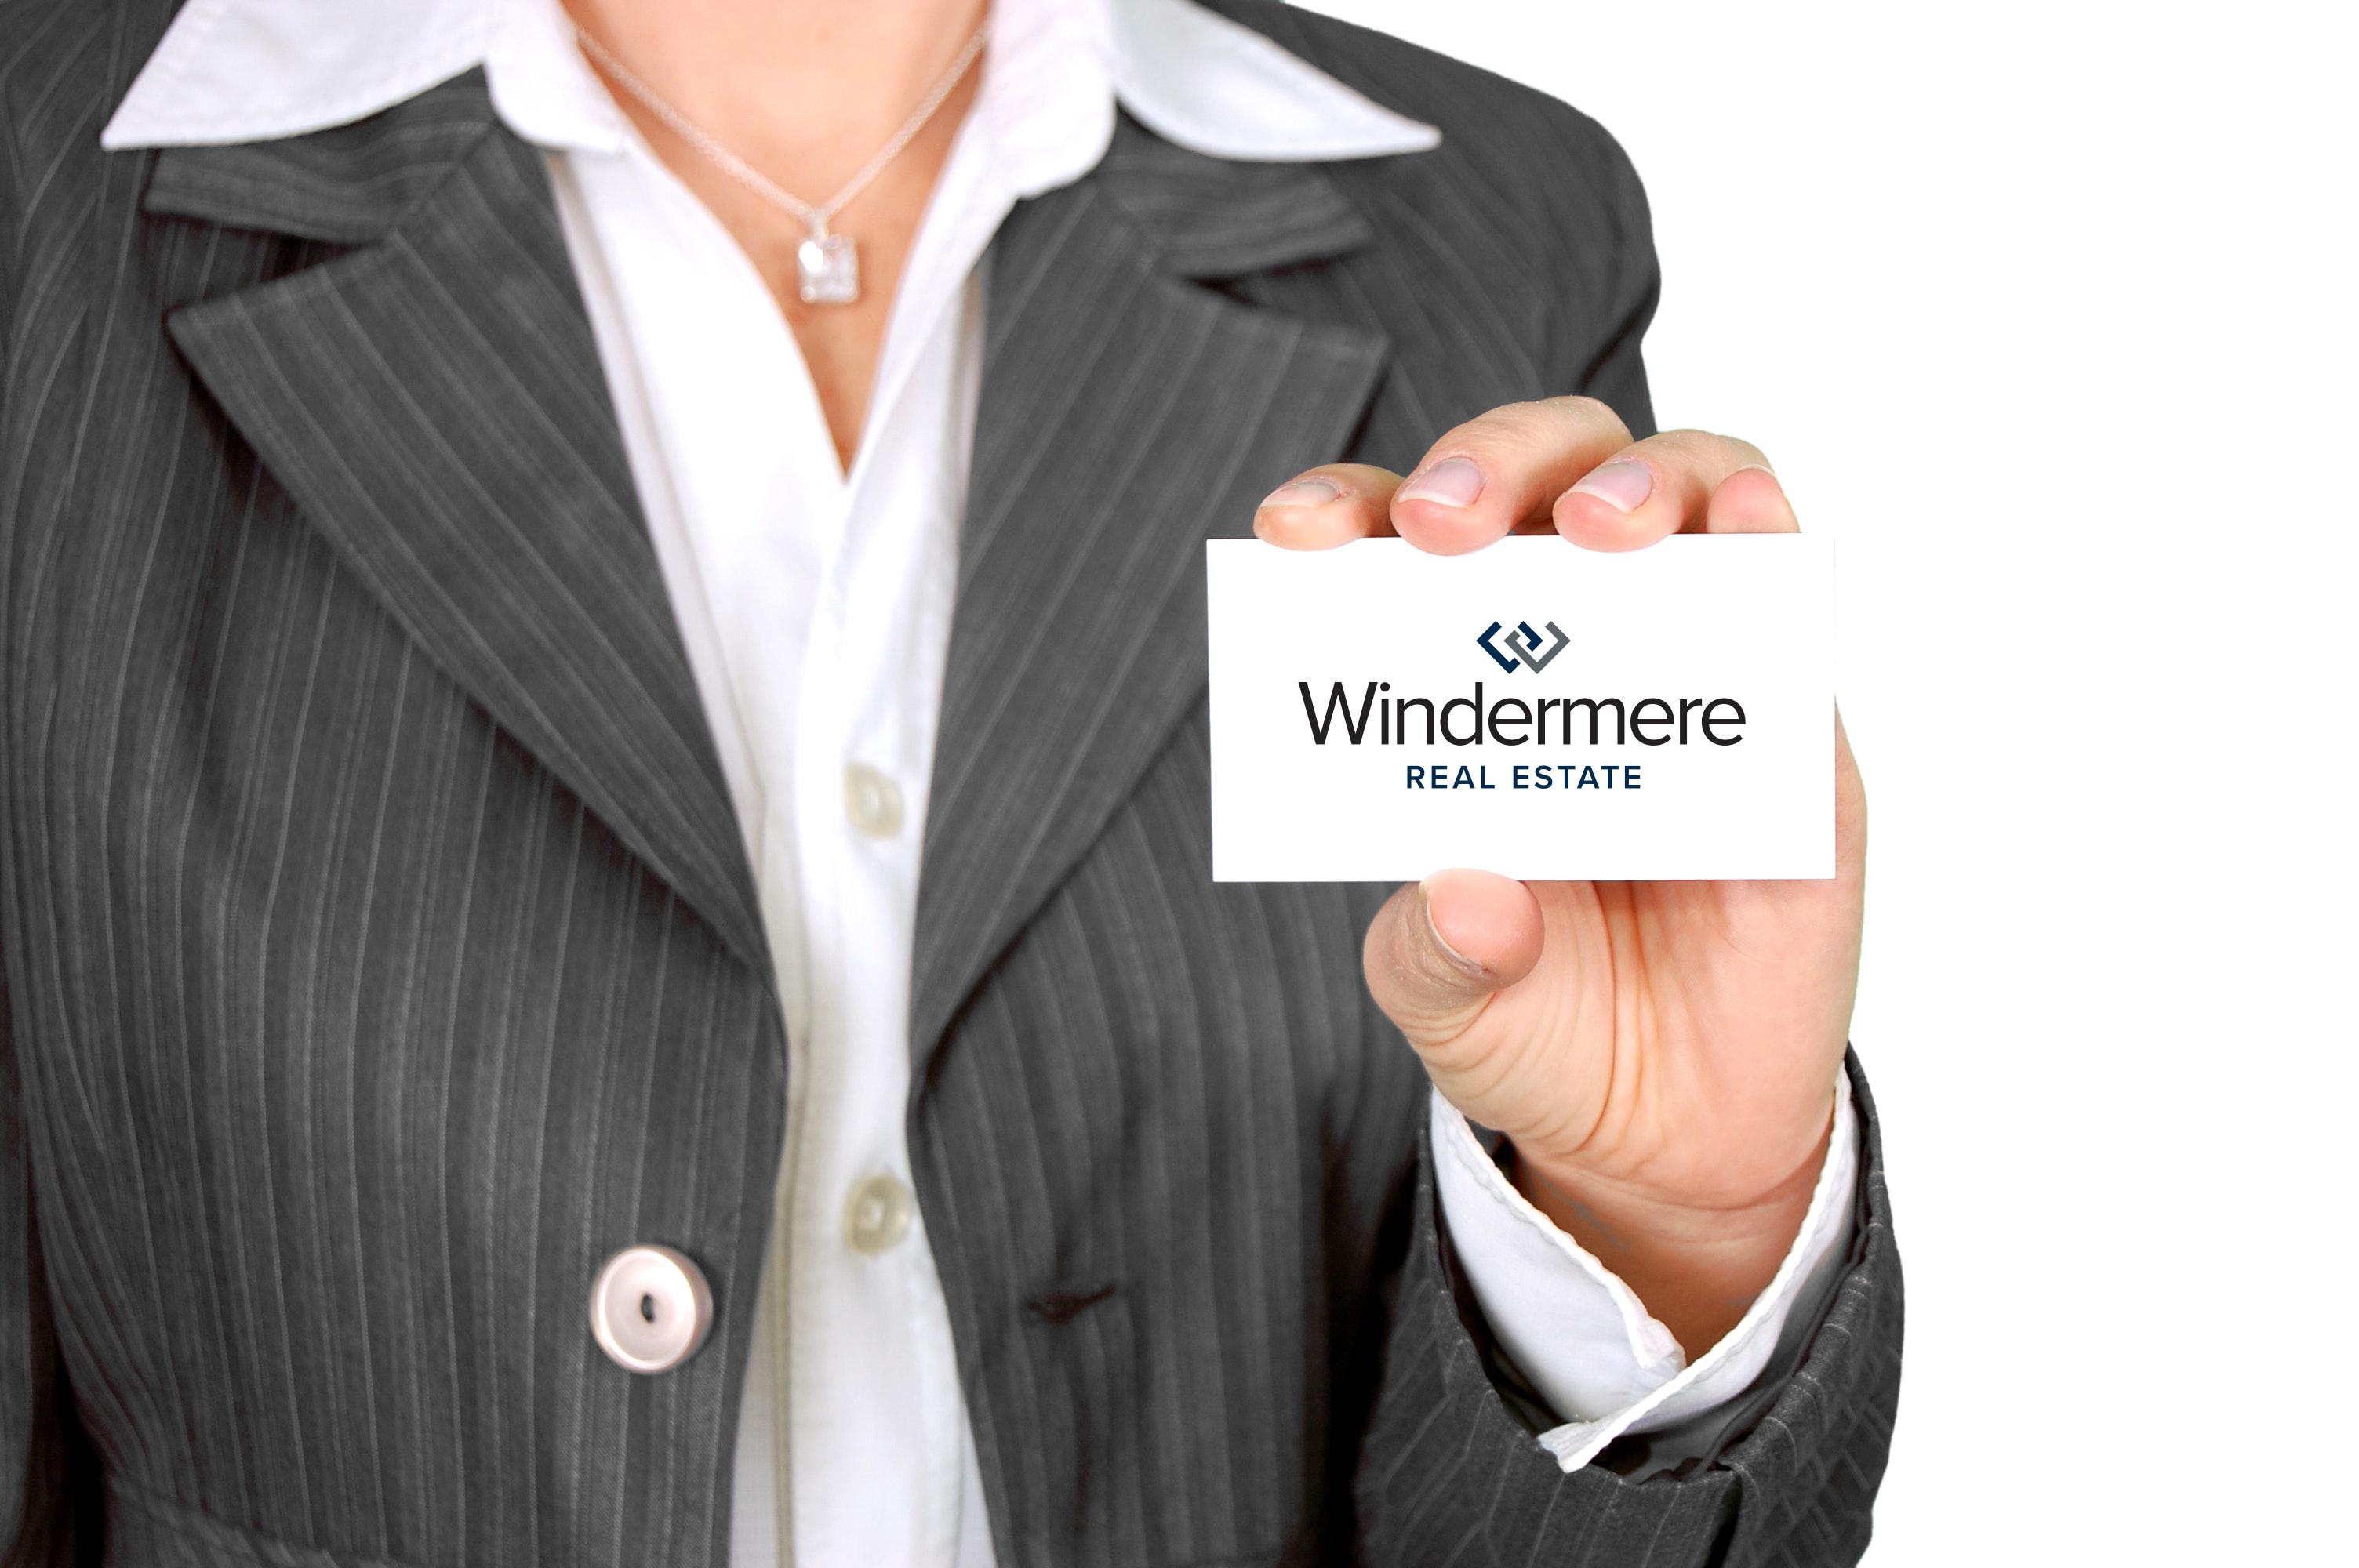 business-business-card-business-WRE